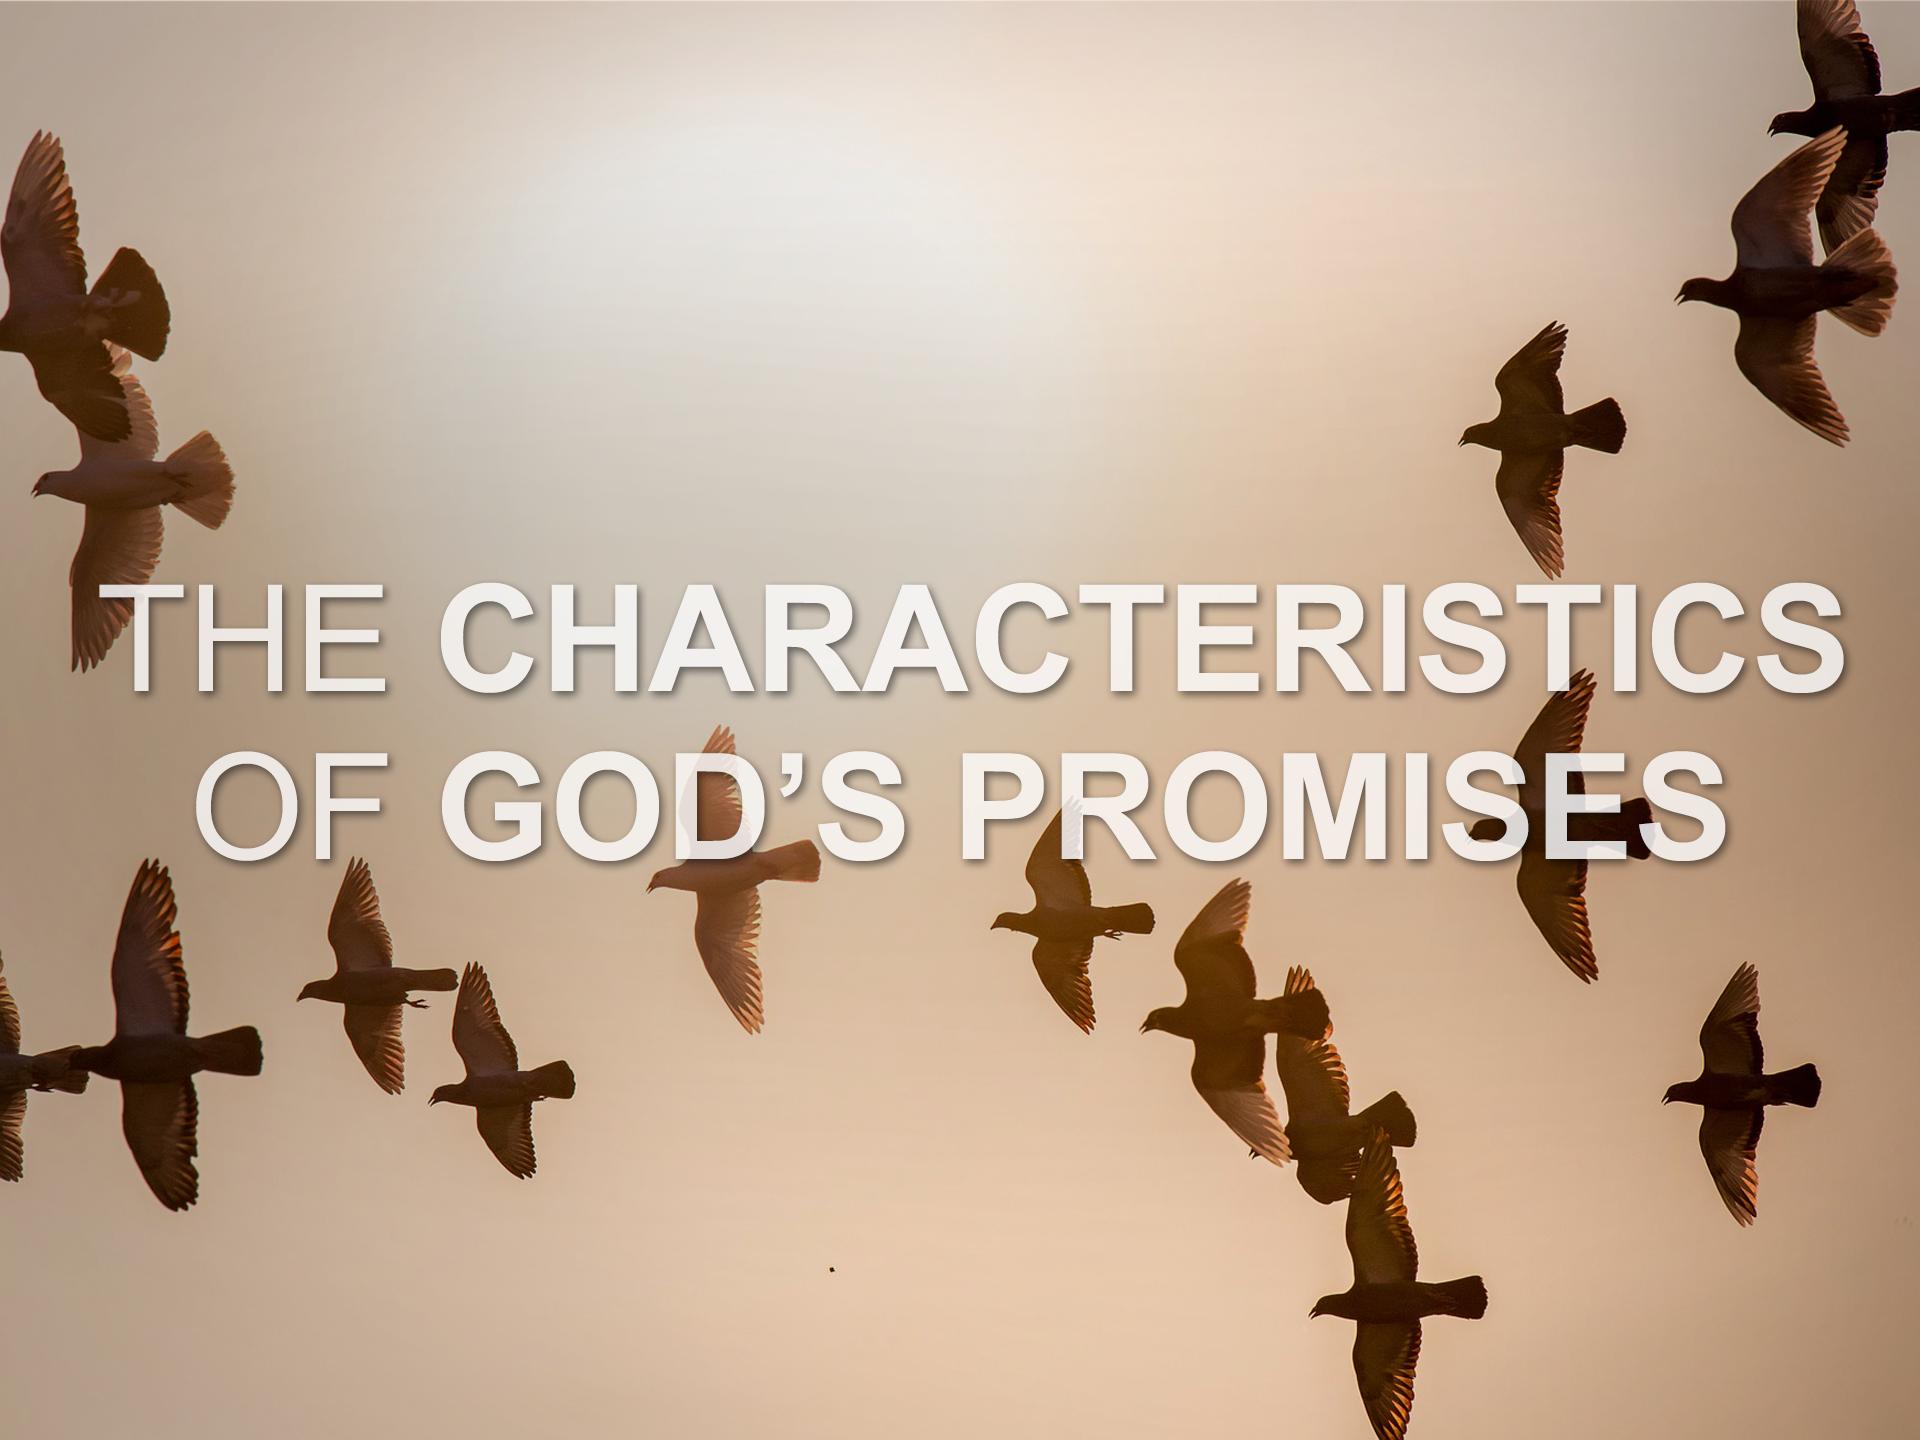 20170910 The Characteristics of Gods Promises.png